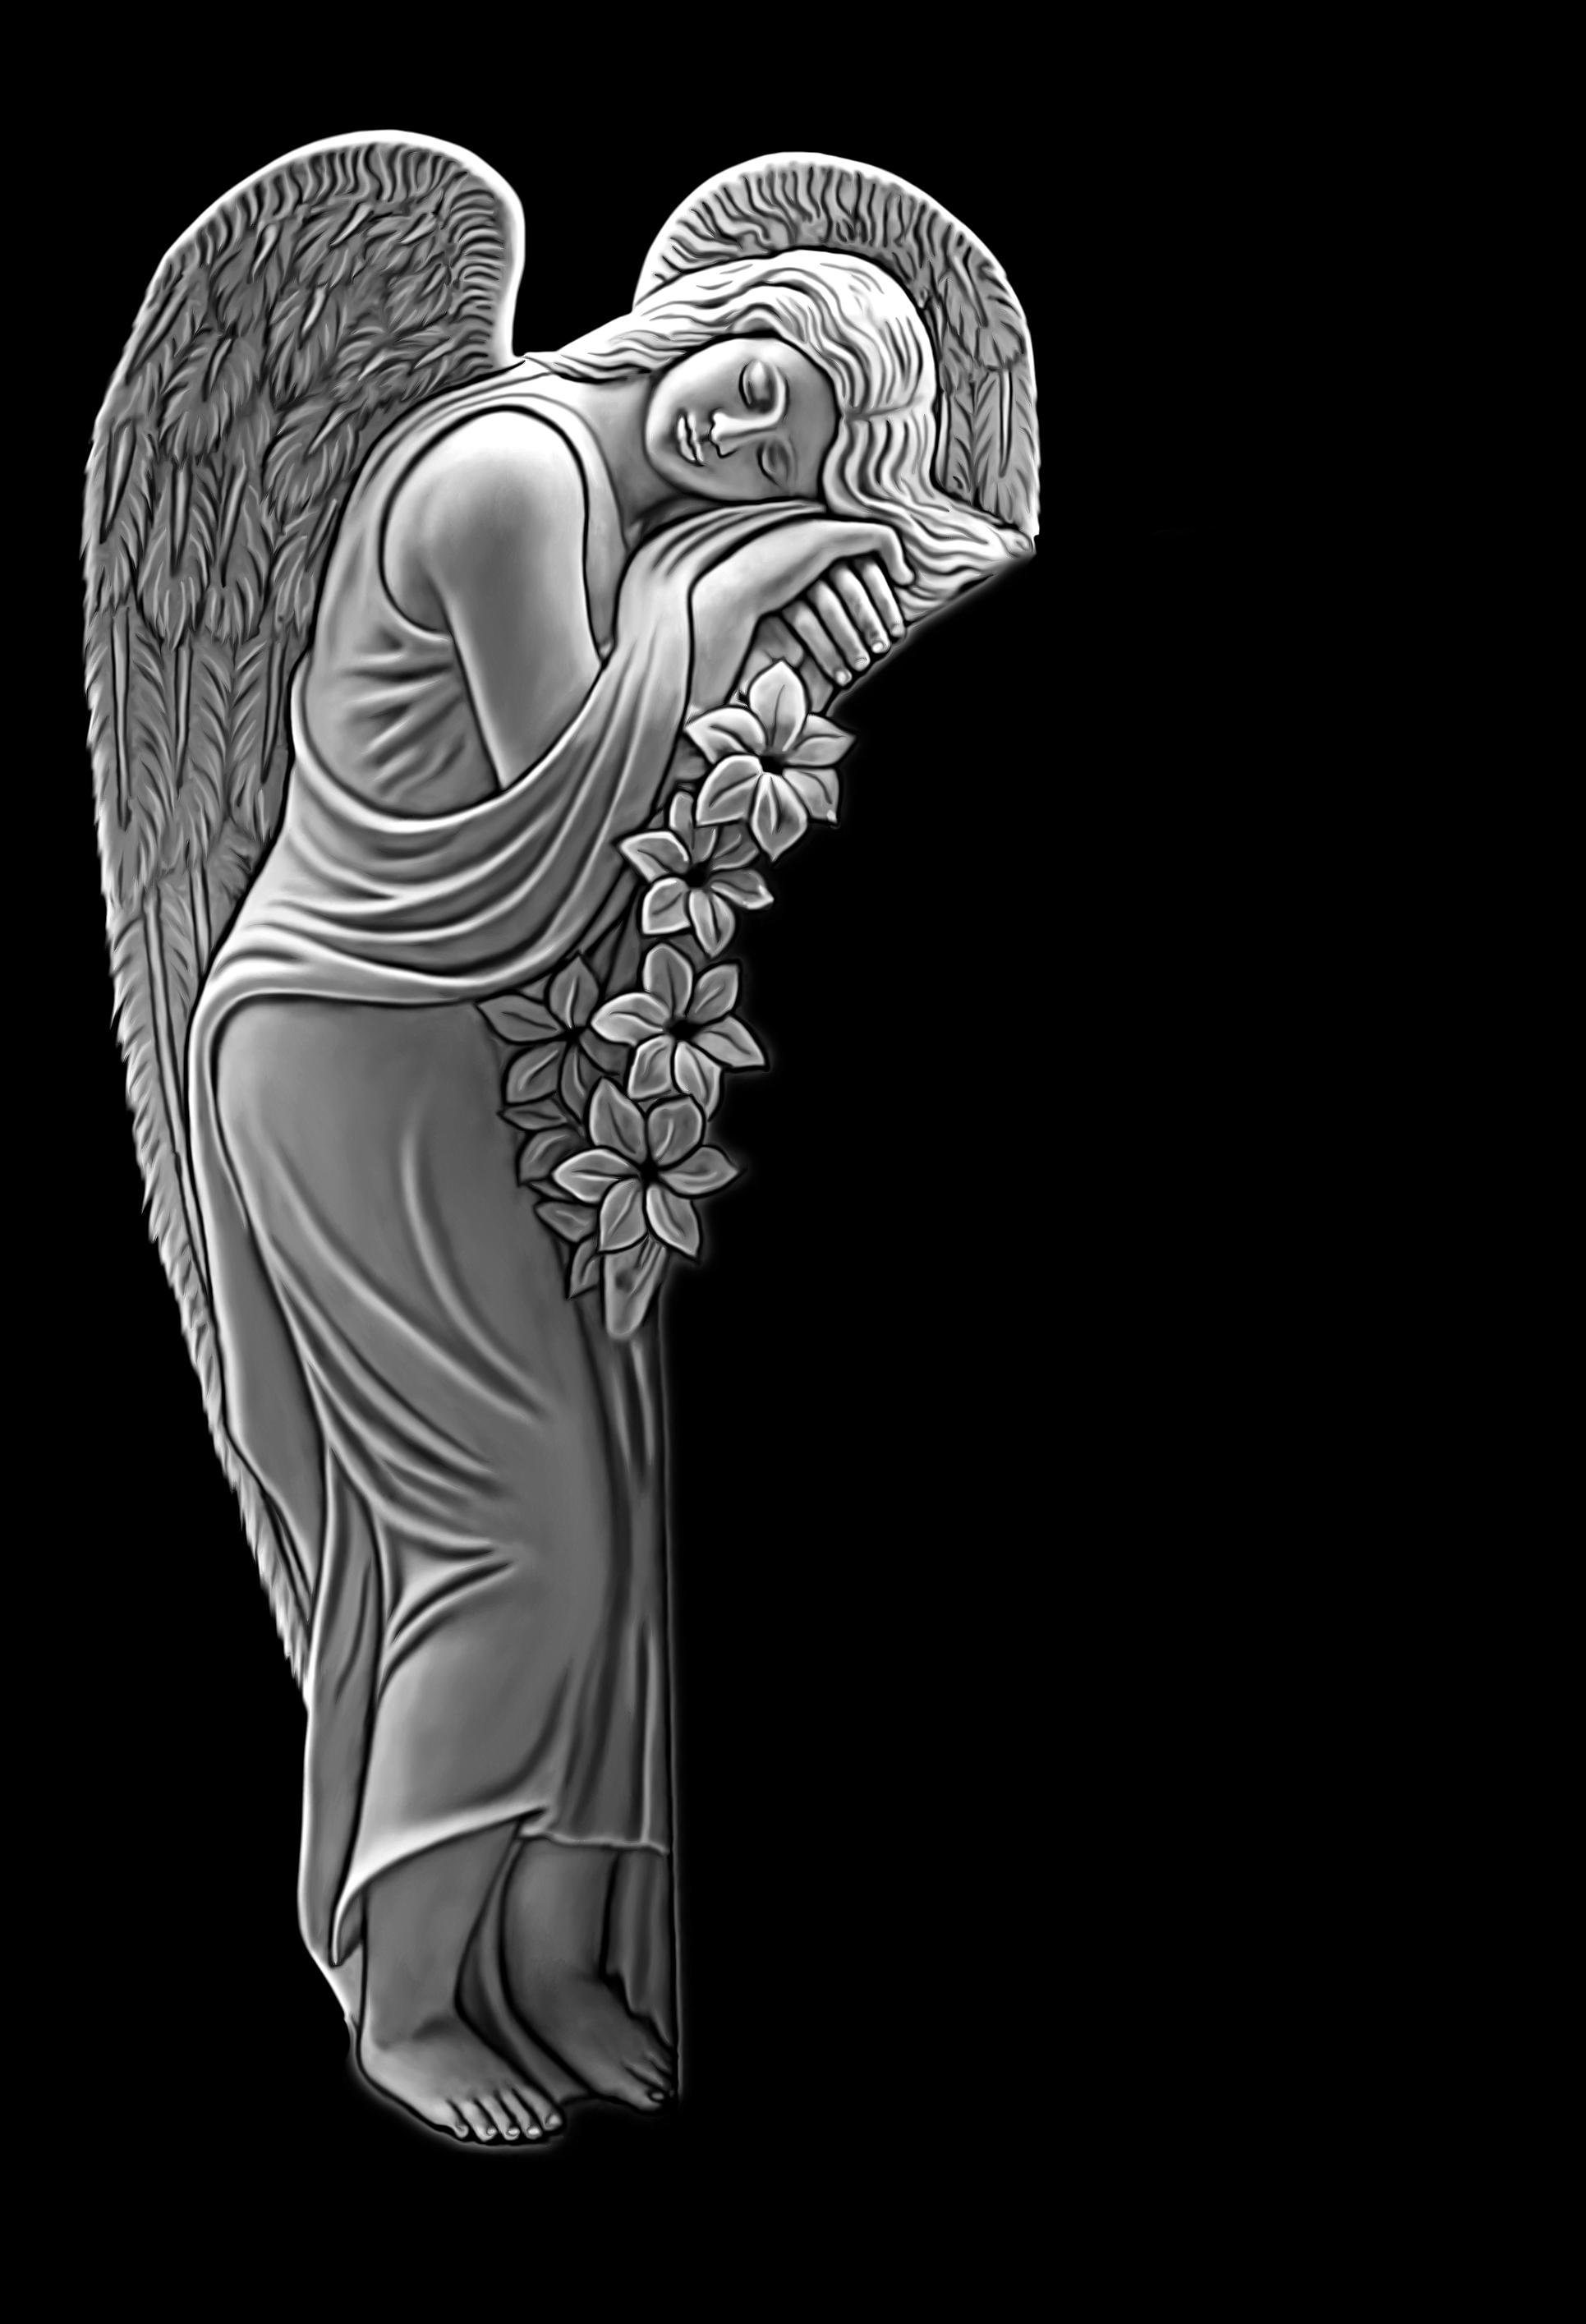 Картинки ангела на надгробьях